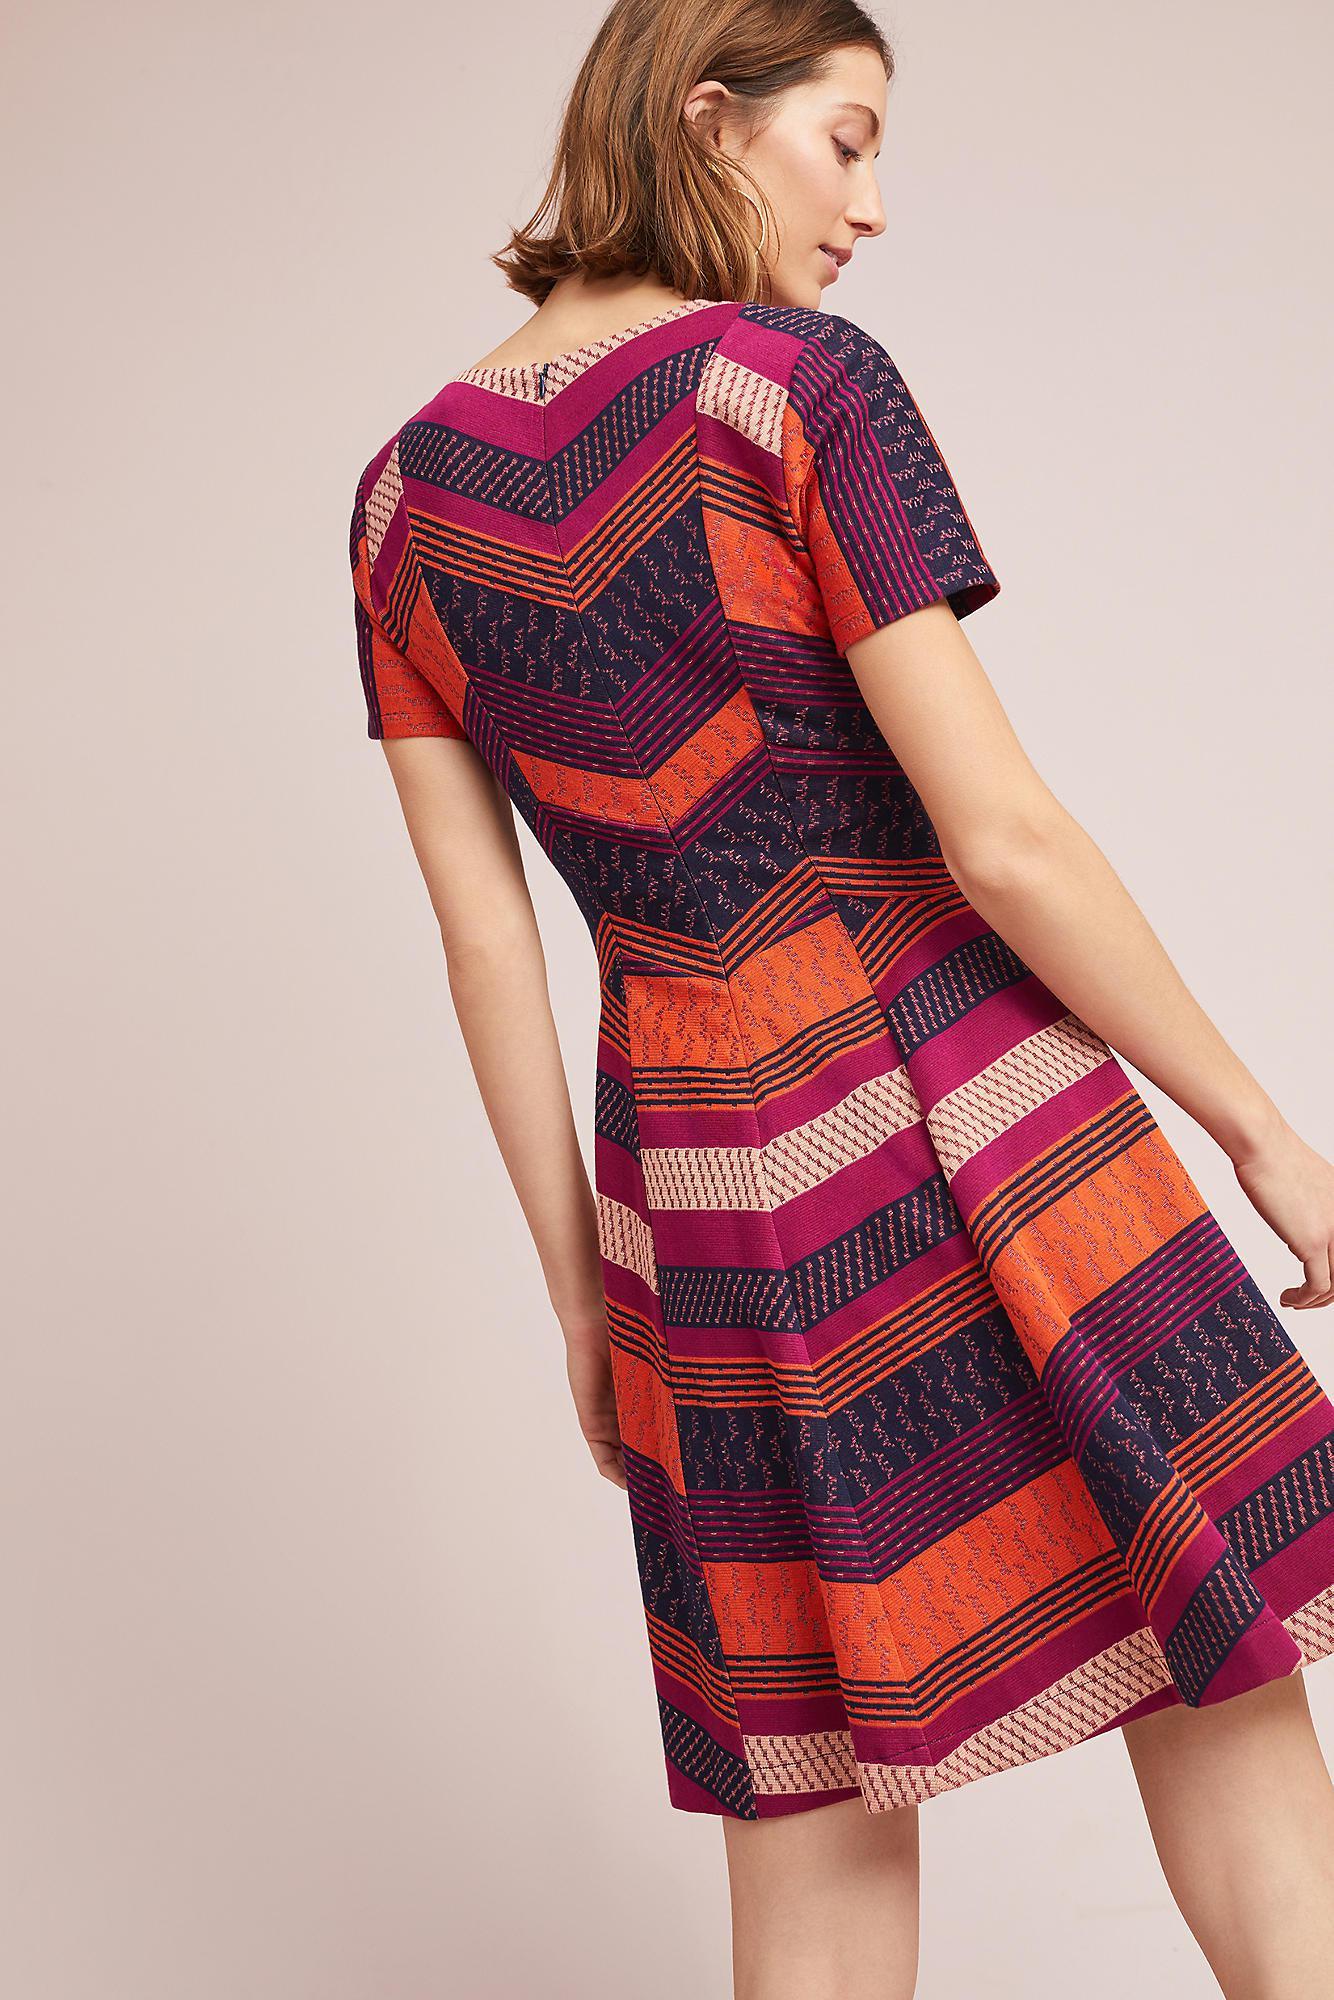 Hd In Paris Cotton Burbank Striped Dress Lyst